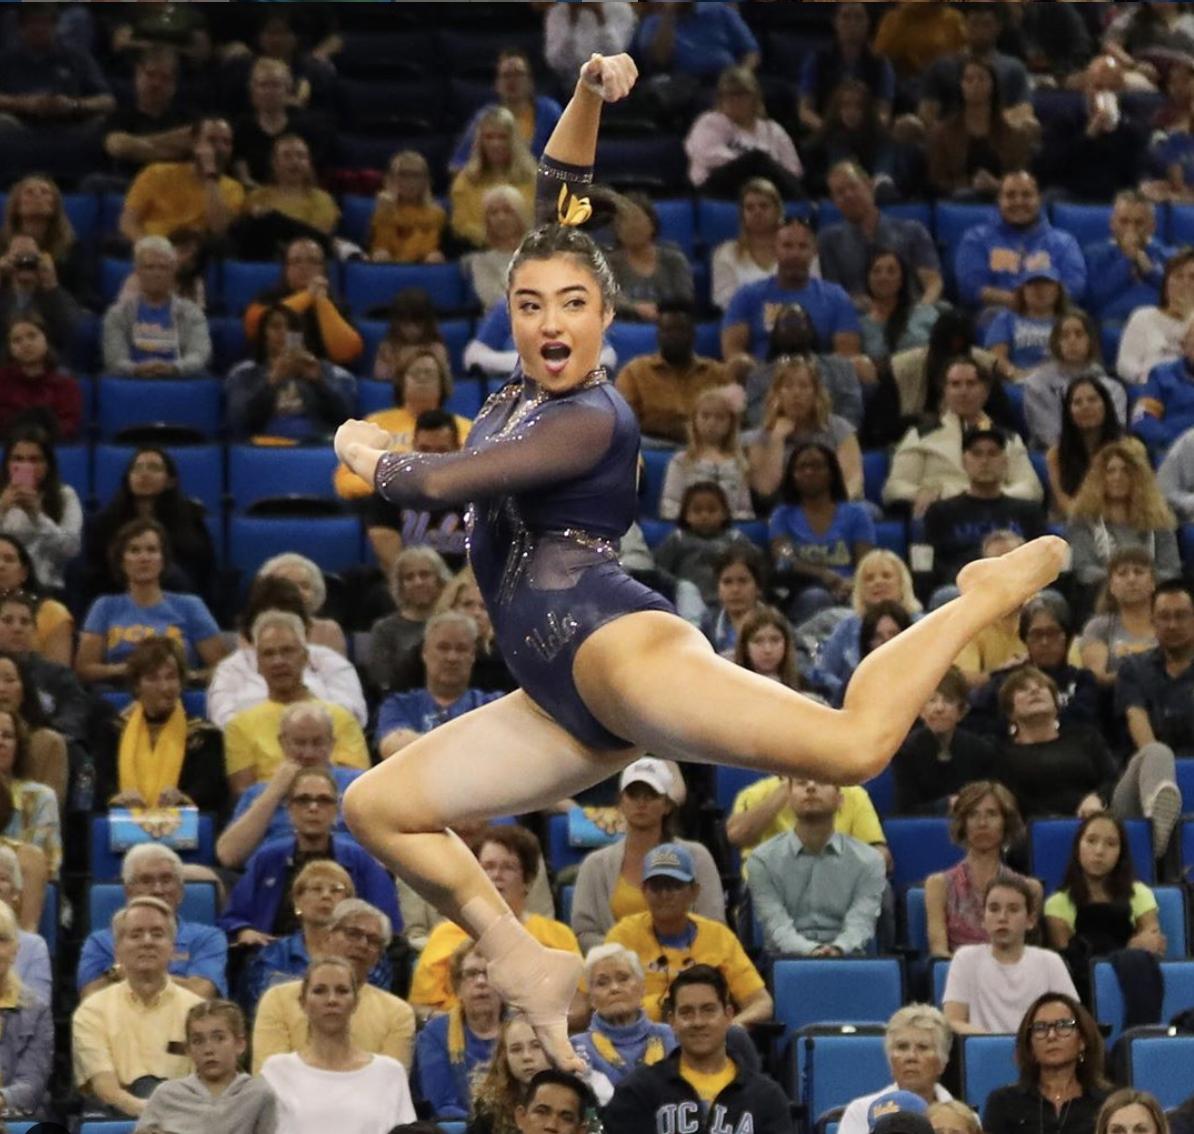 a gymnast jumping